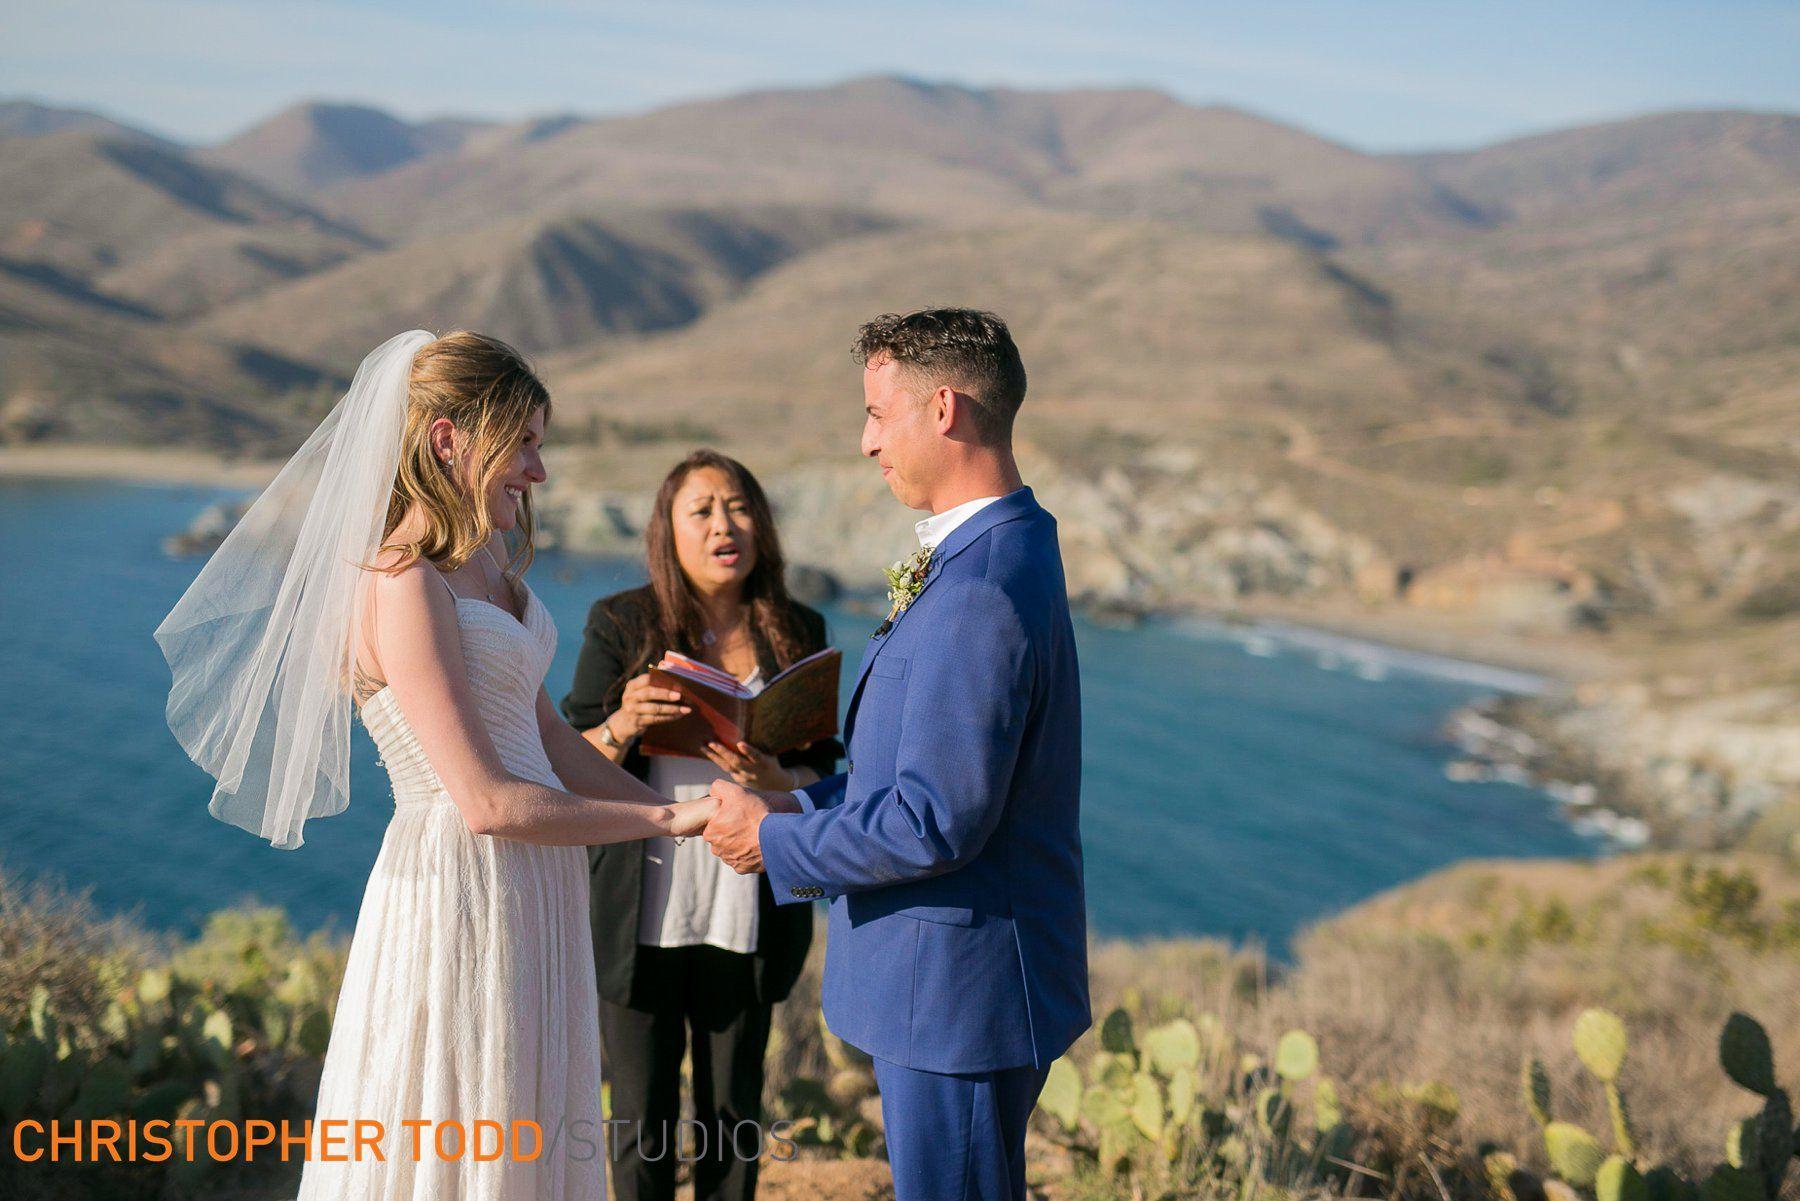 Catalina Island Elopement Wedding venues, Couple photos